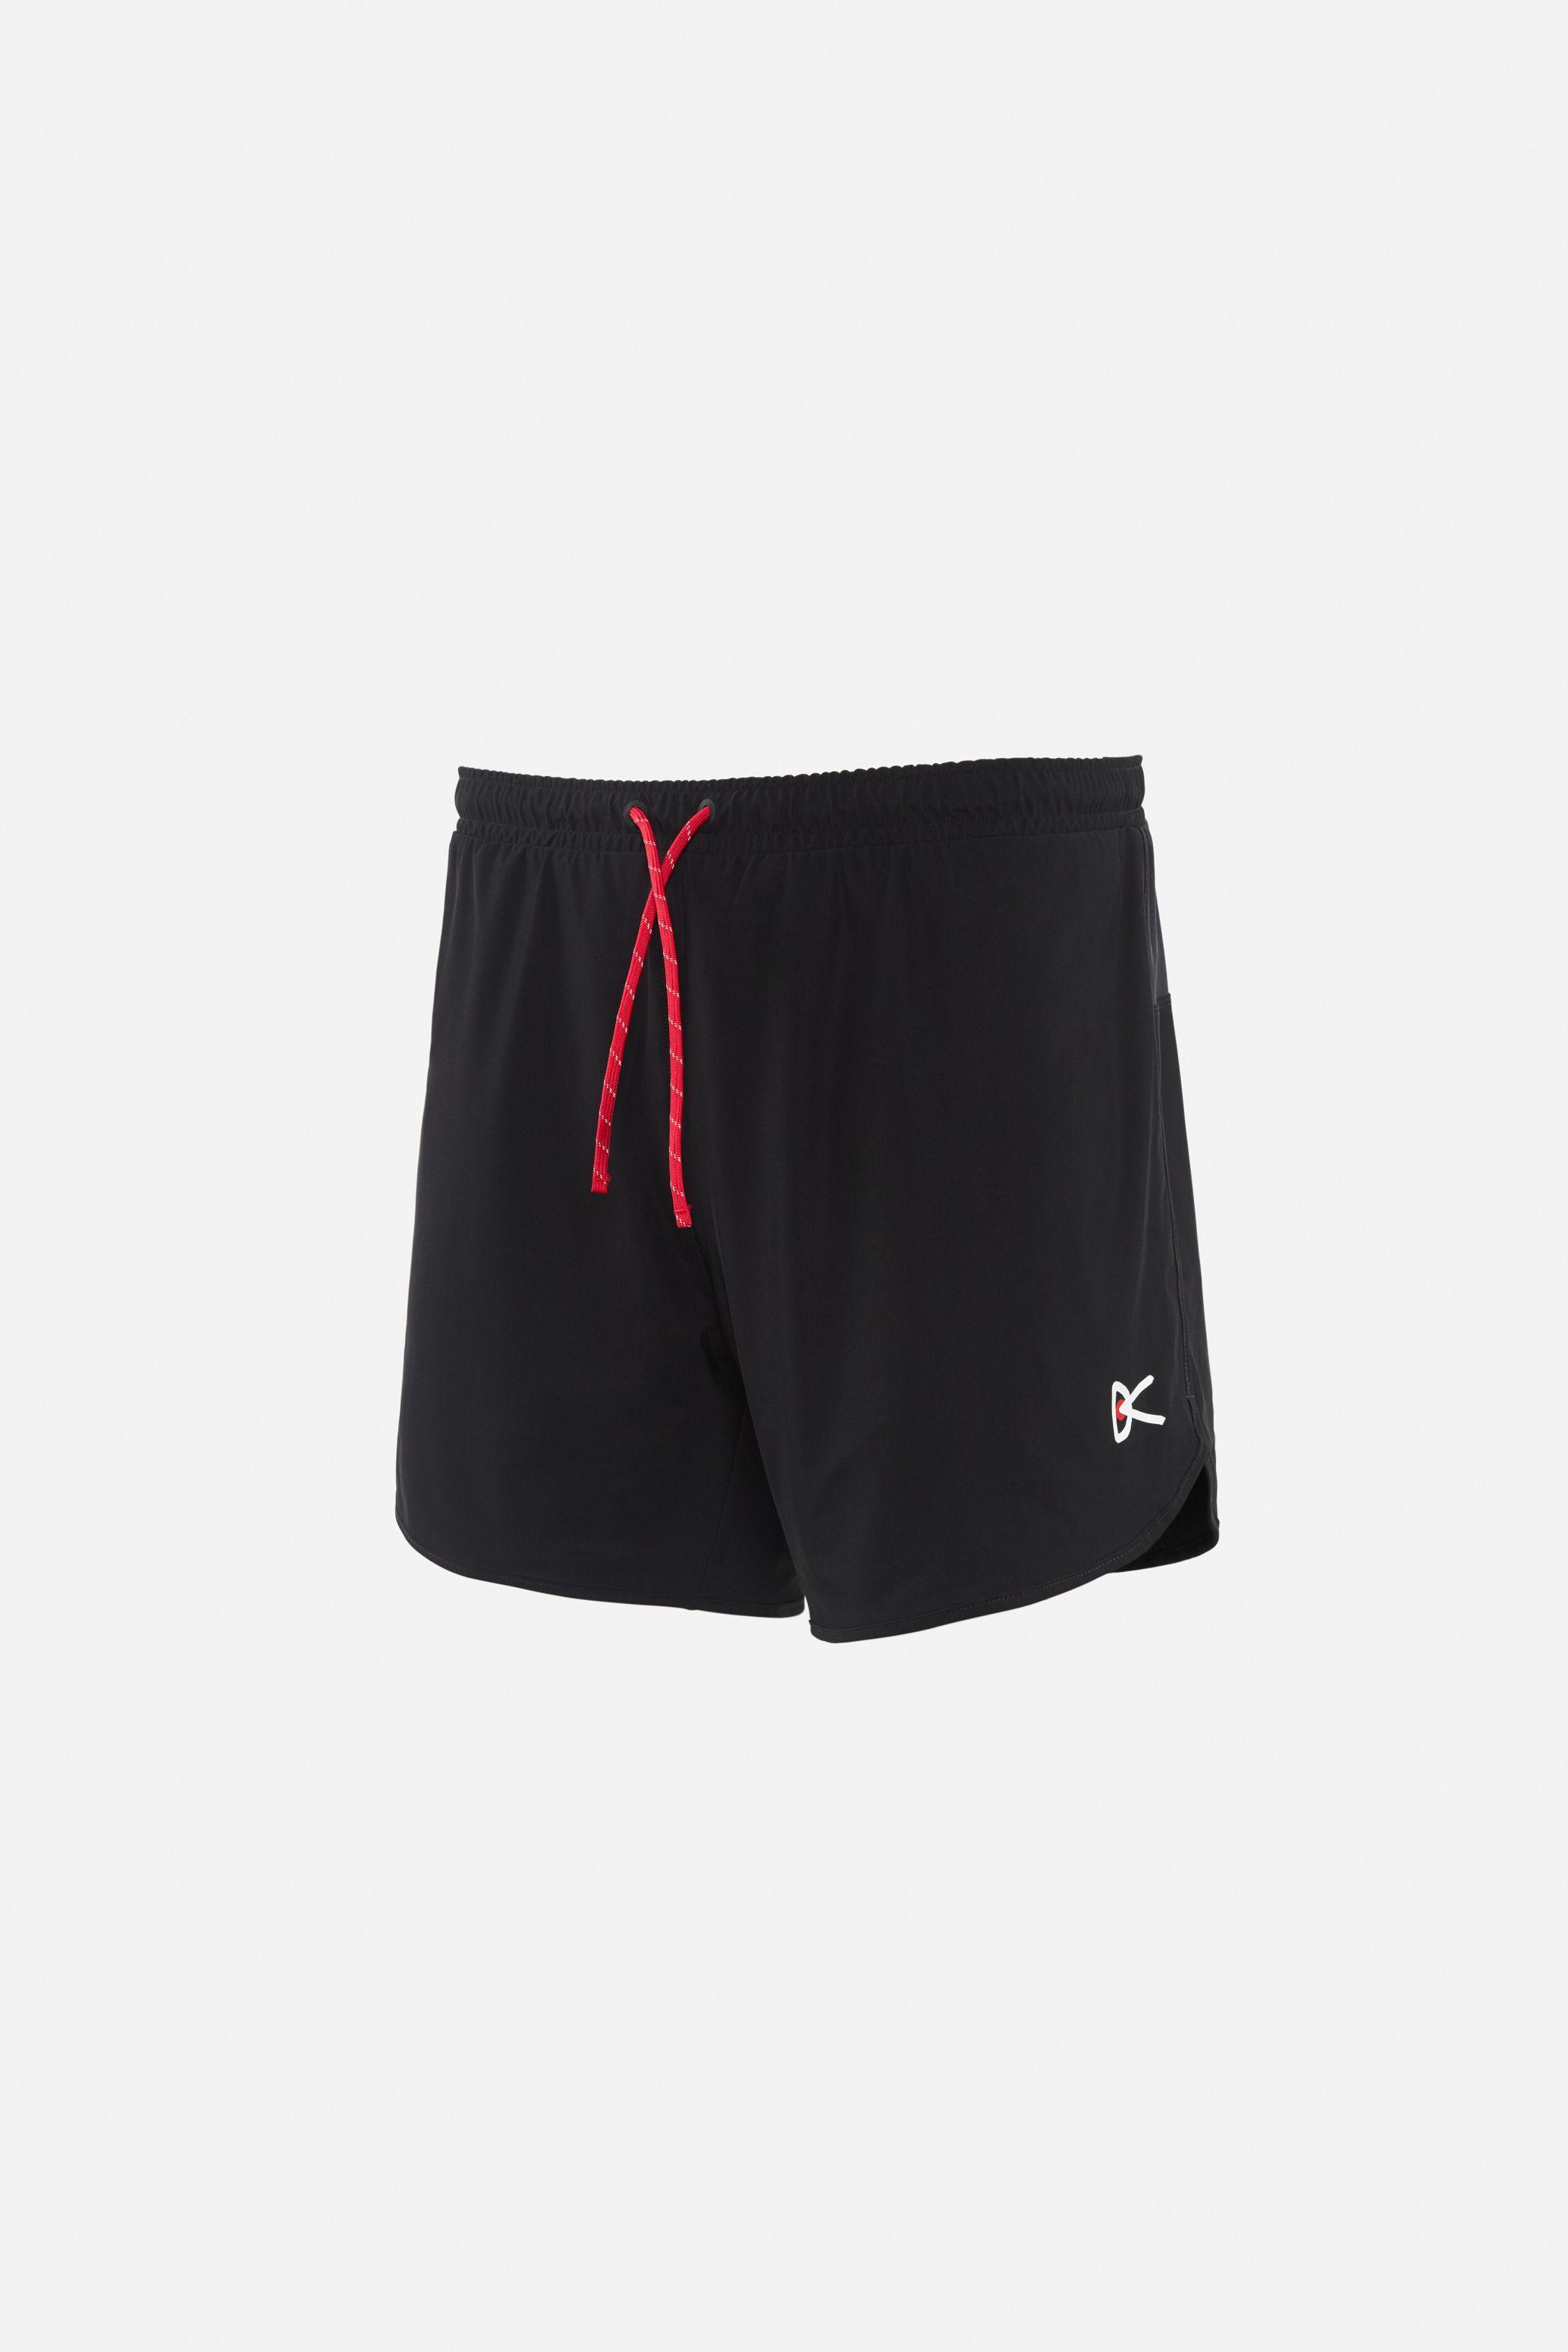 Spino 5 inch Training Shorts, Black